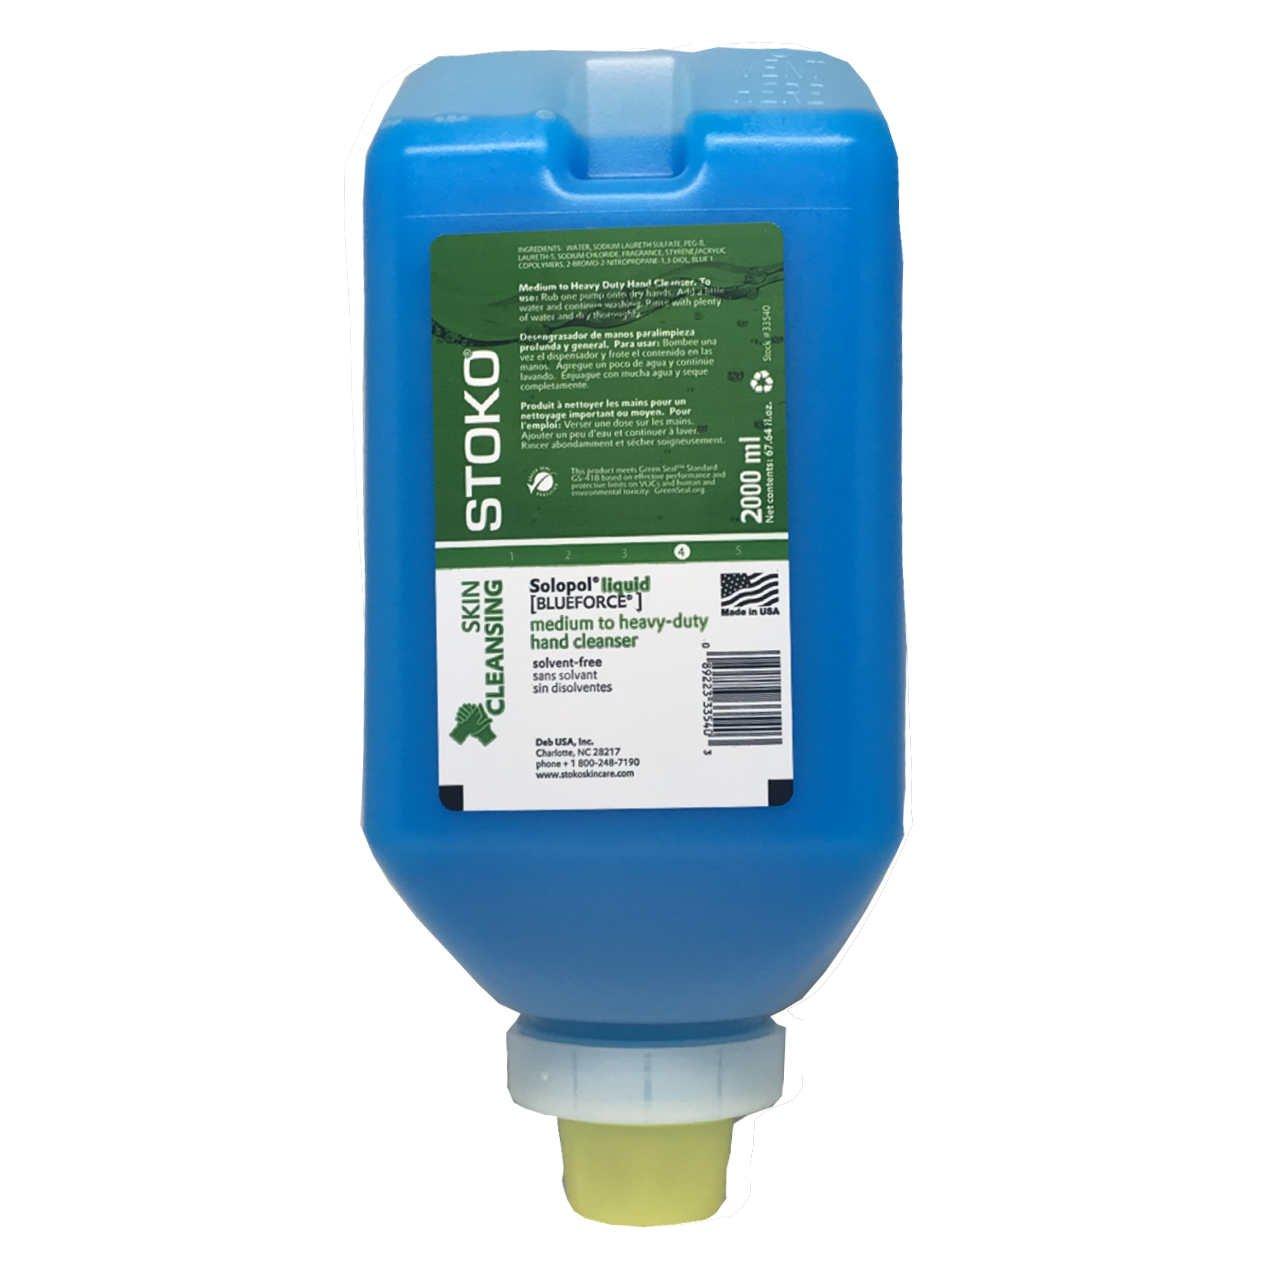 Solopol Liquid [Blue Force] 2L (33540) + Dispenser (PN55980806): Amazon.com: Industrial & Scientific